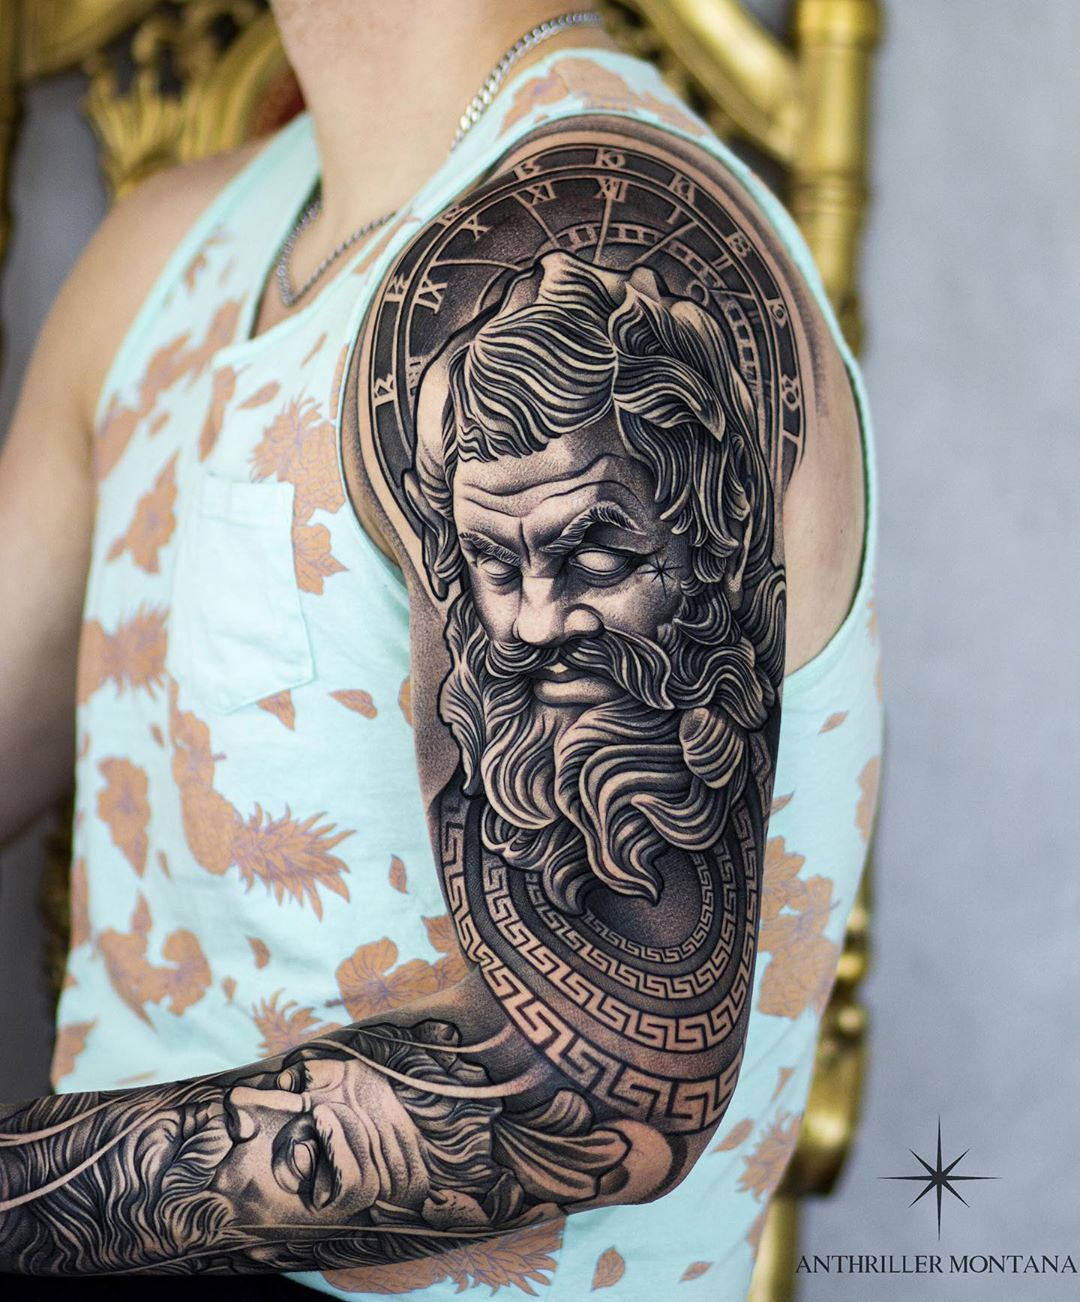 "Poseidon Chest Tattoo : poseidon, chest, tattoo, 6,571, Likes,, Comments, ✷ANTHRILLER.MONTANA✷, (@anthriller_montana), Instagram:, ""✷DENMARK✷, JANUARY, 13-17, 🇩…, Greek, Tattoos,, Poseidon, Tattoo,, Mythology, Tattoos"